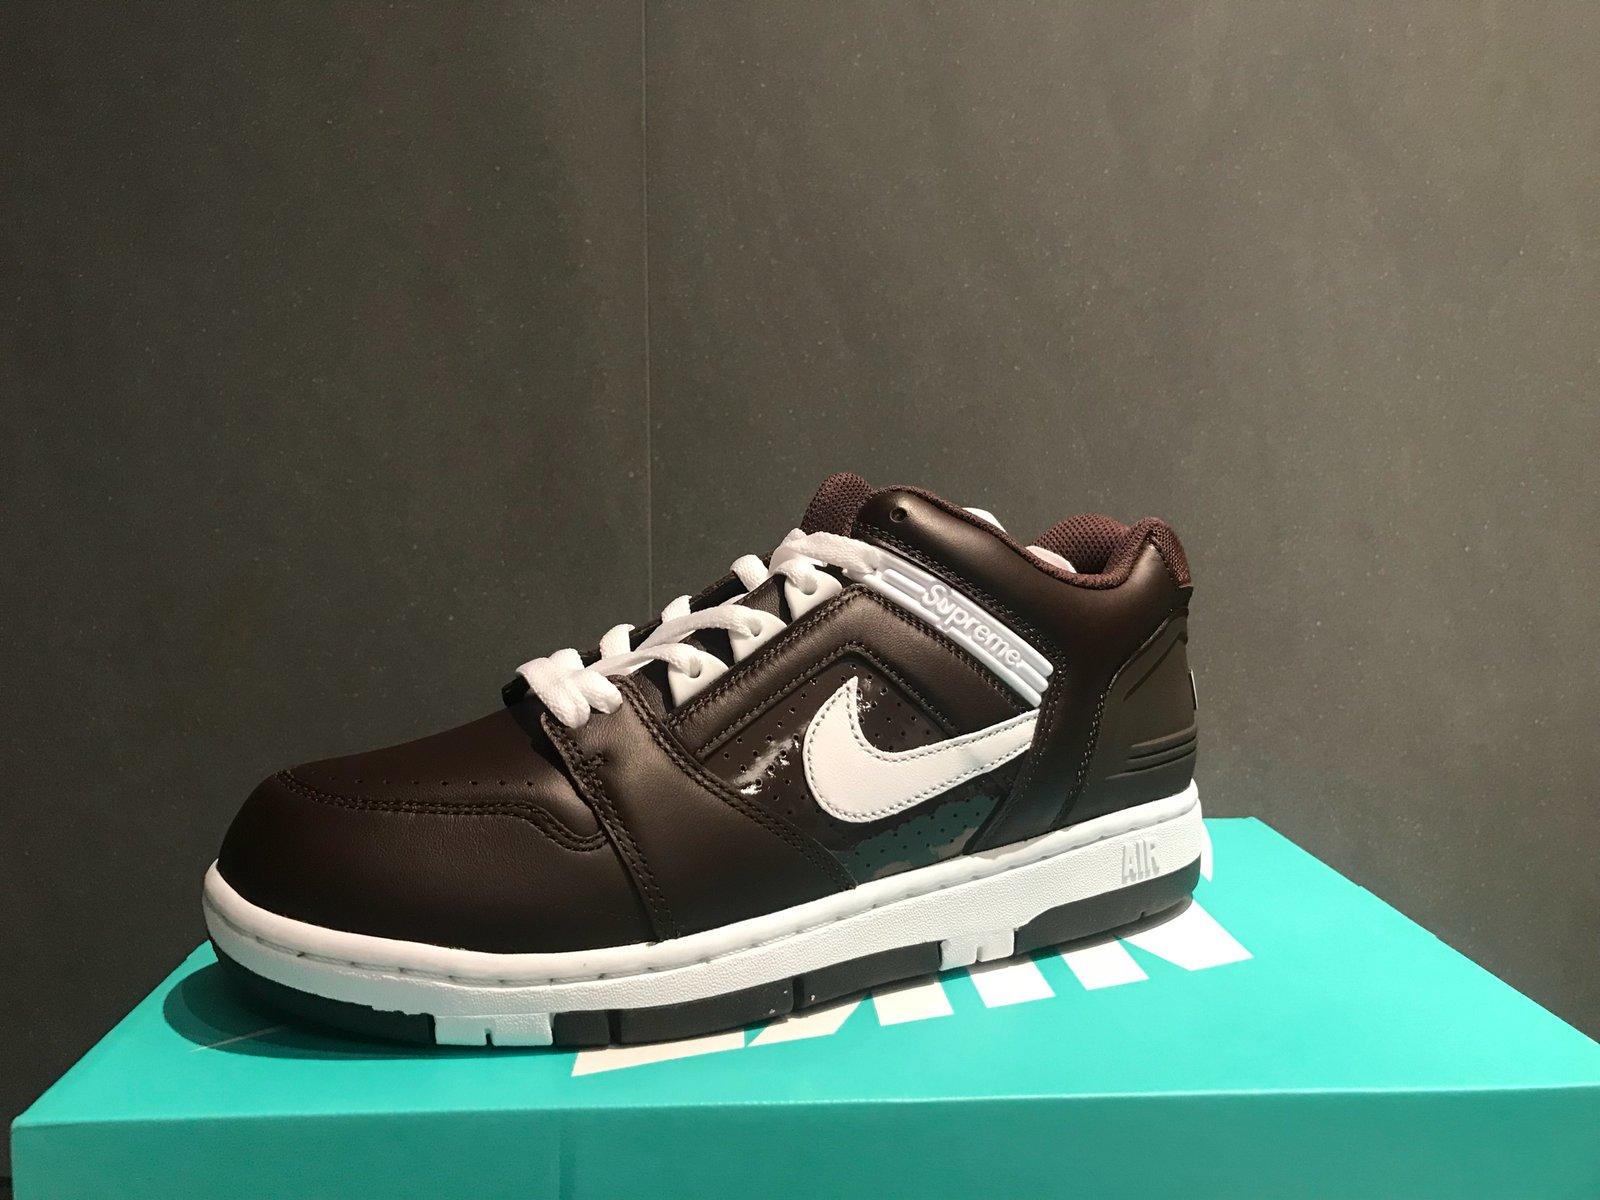 Nike X Air Force 2 Supreme Brown b7gyf6